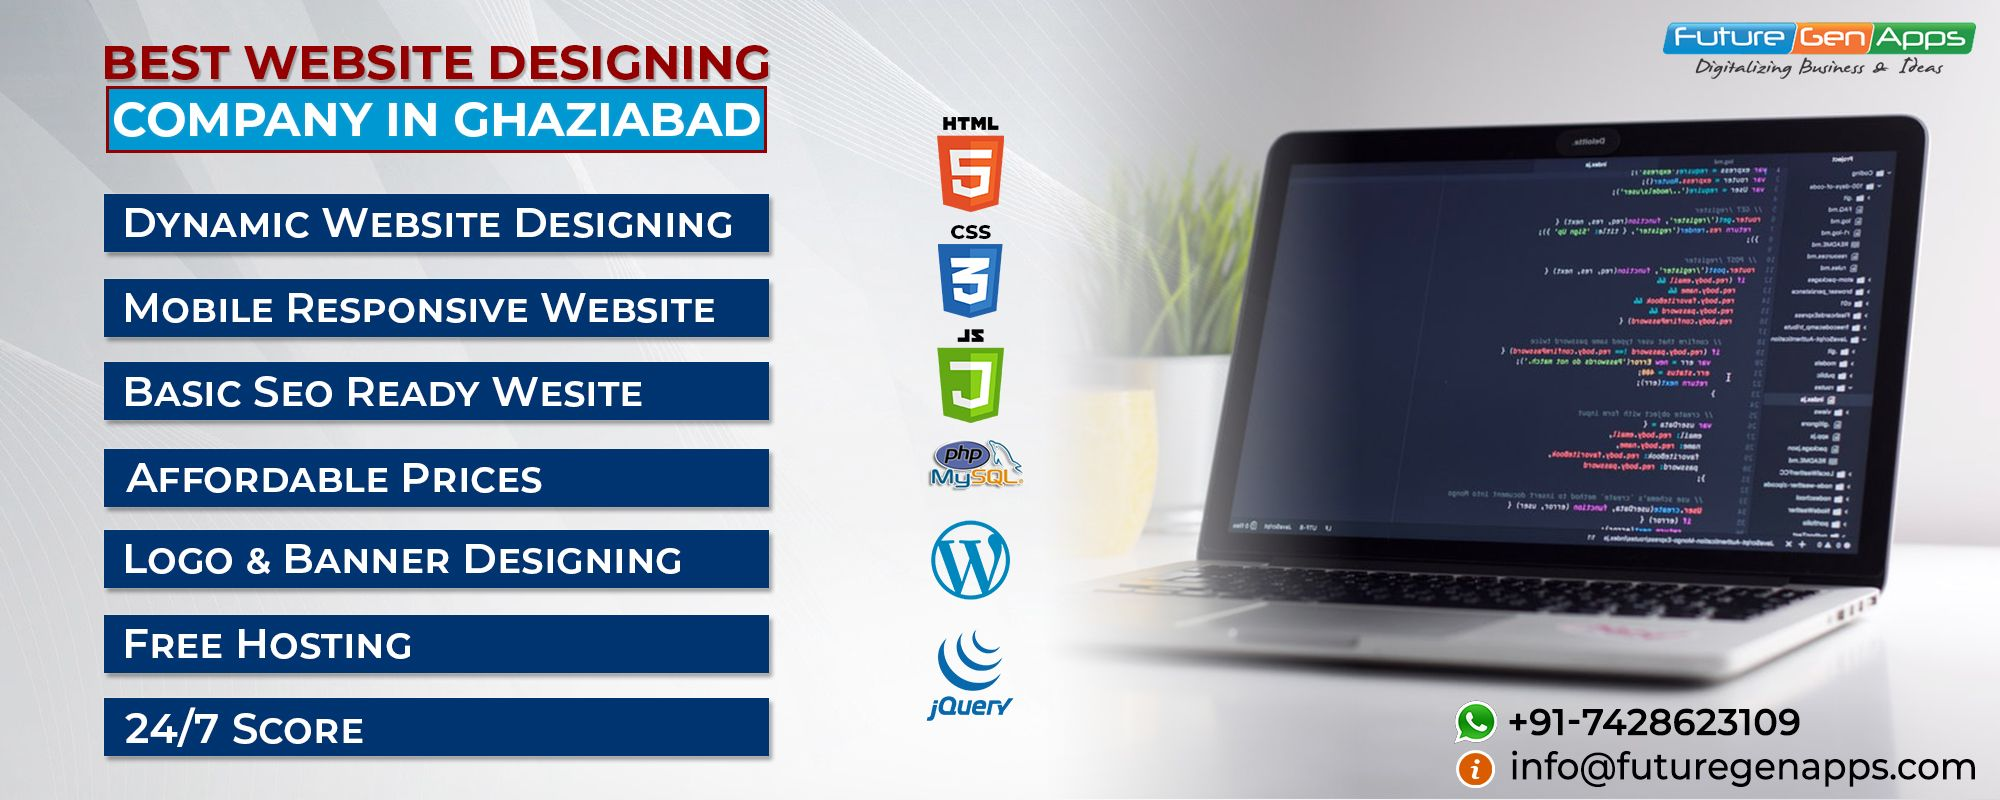 Web Design Company In Ghaziabad Website Design Services Website Www Desiresolutions Tech Website Design Services Web Design Company Web Development Company